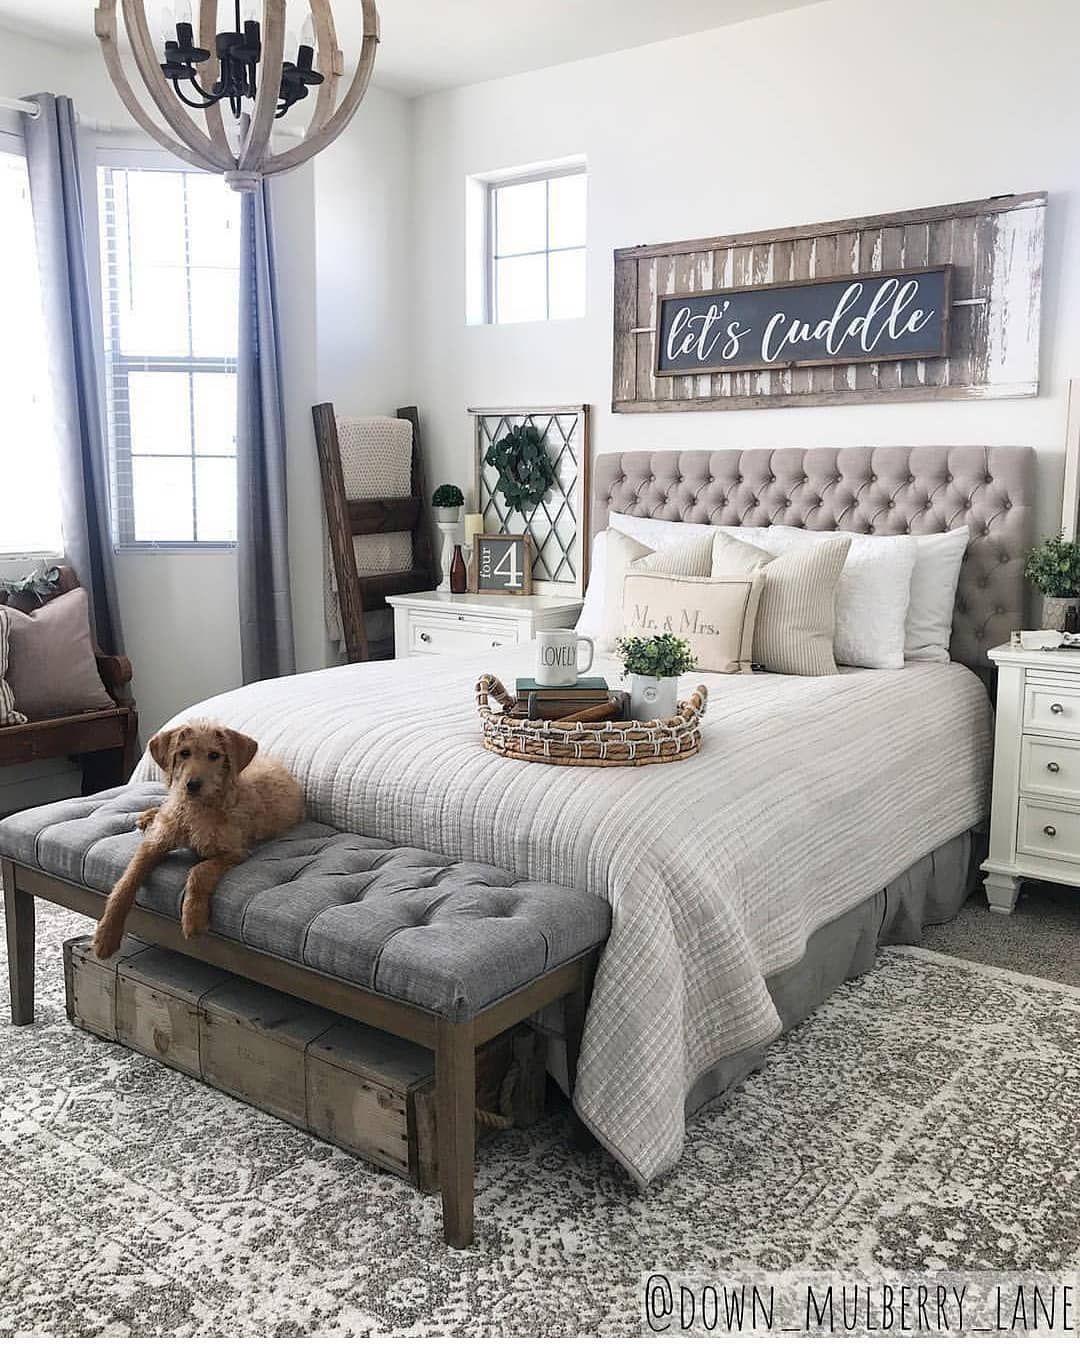 42 Farmhouse Rustic Master Bedroom Ideas Rustic Master Bedroom